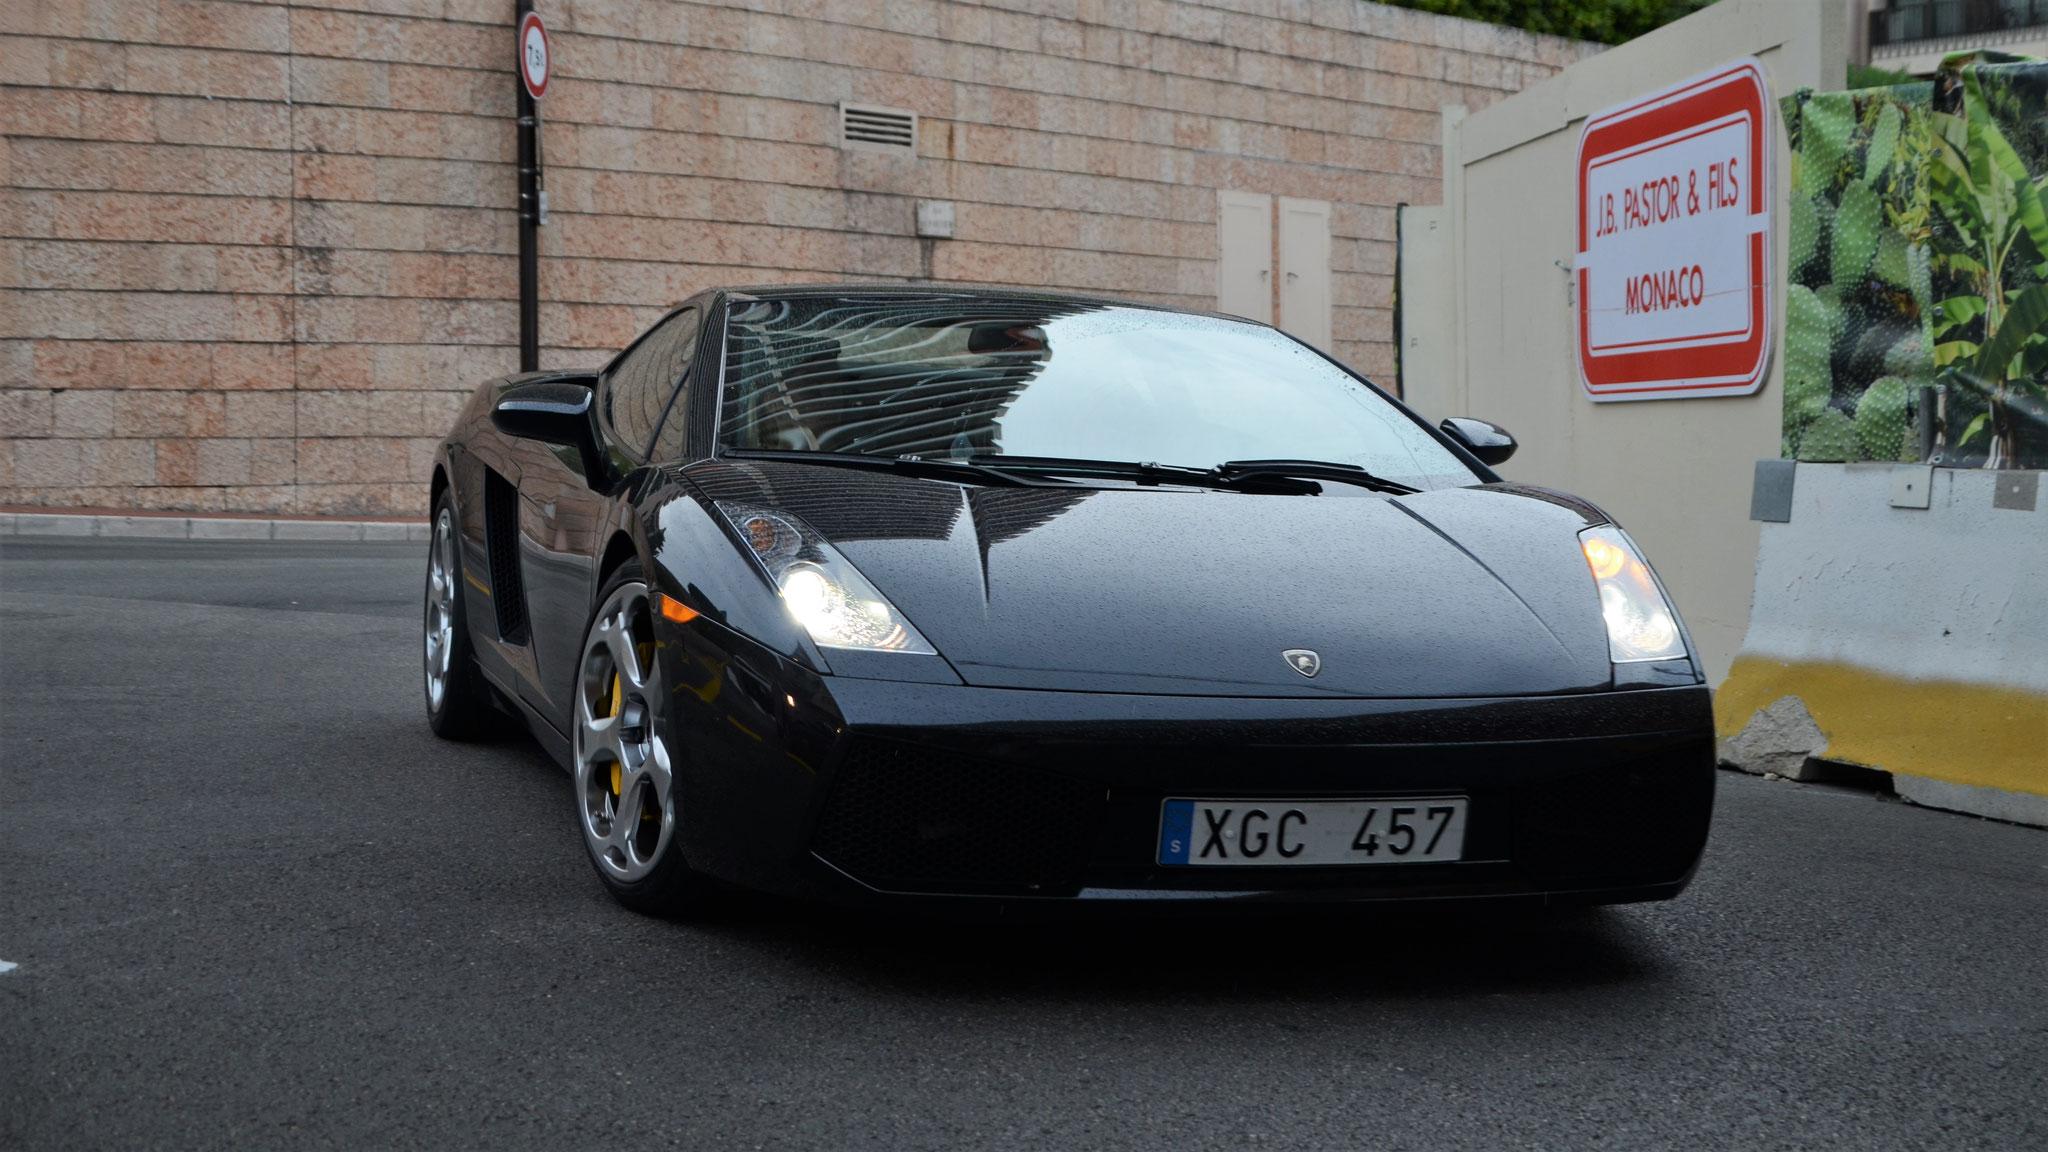 Lamborghini Gallardo Coupé - XGC-457 (SWE)